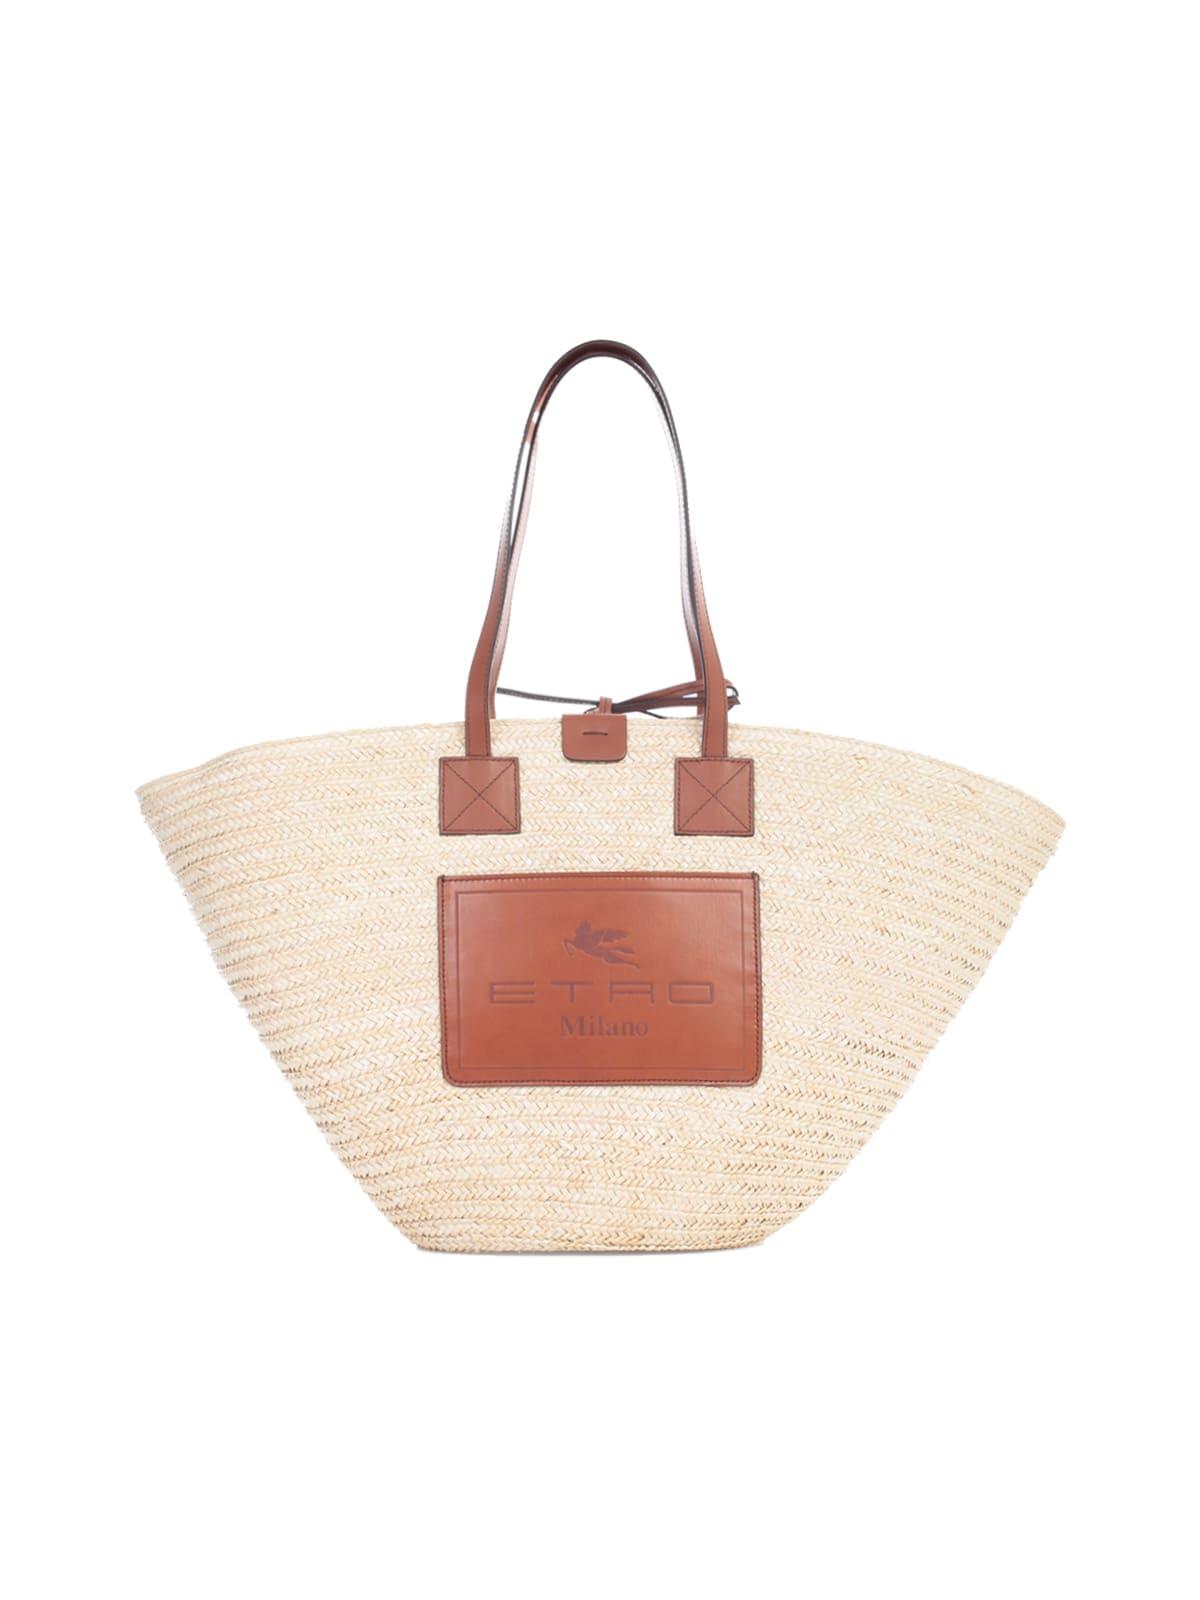 Etro Tote Beach Bag